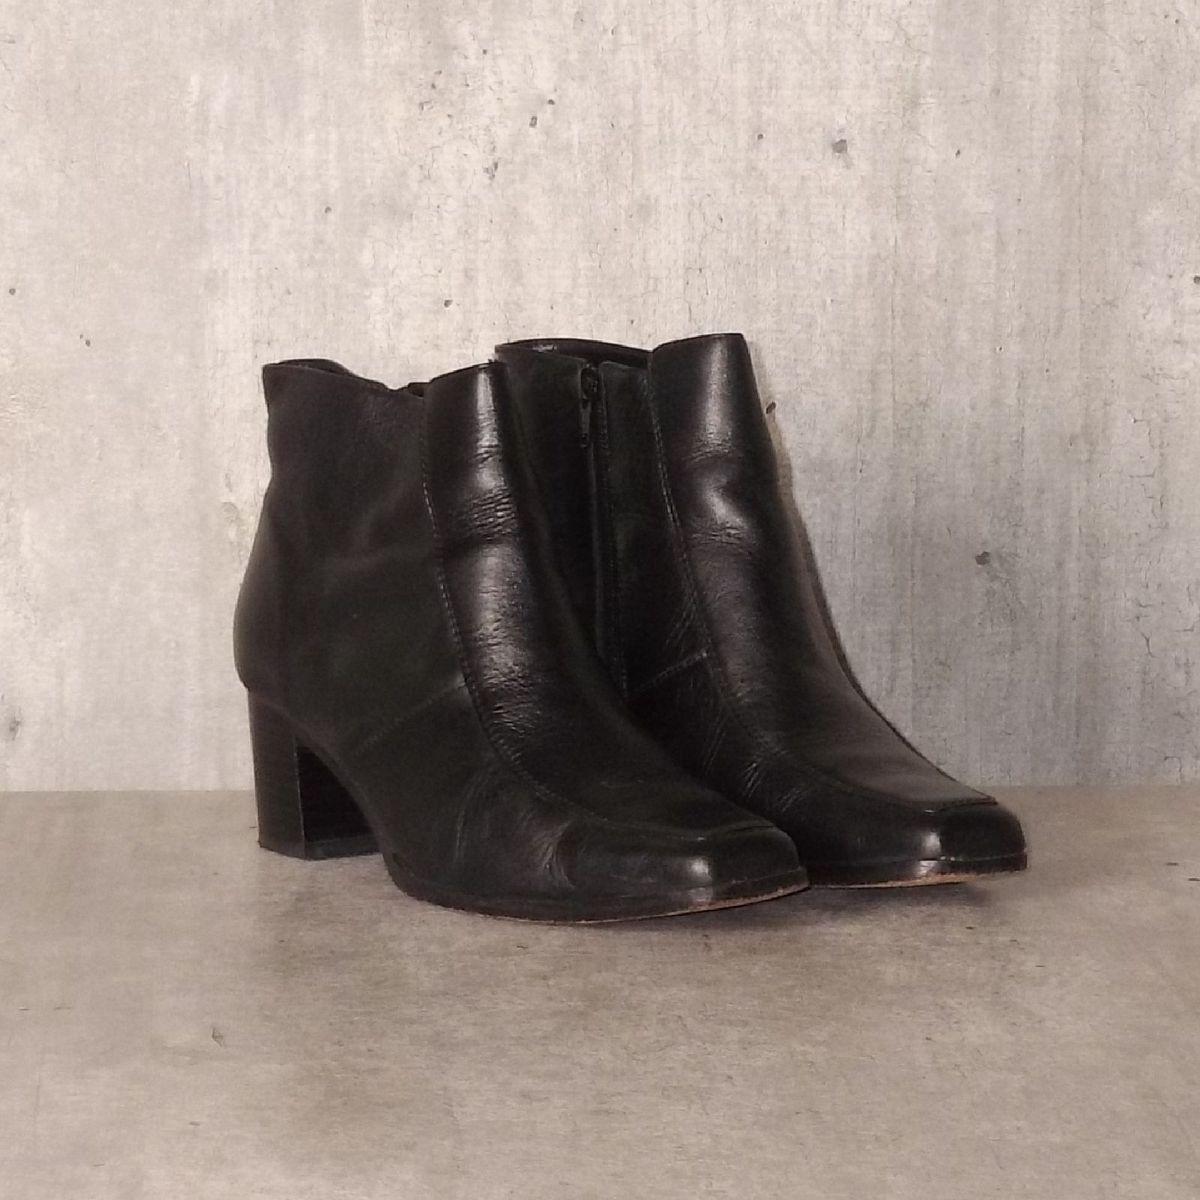 bota preta corello - botas corello